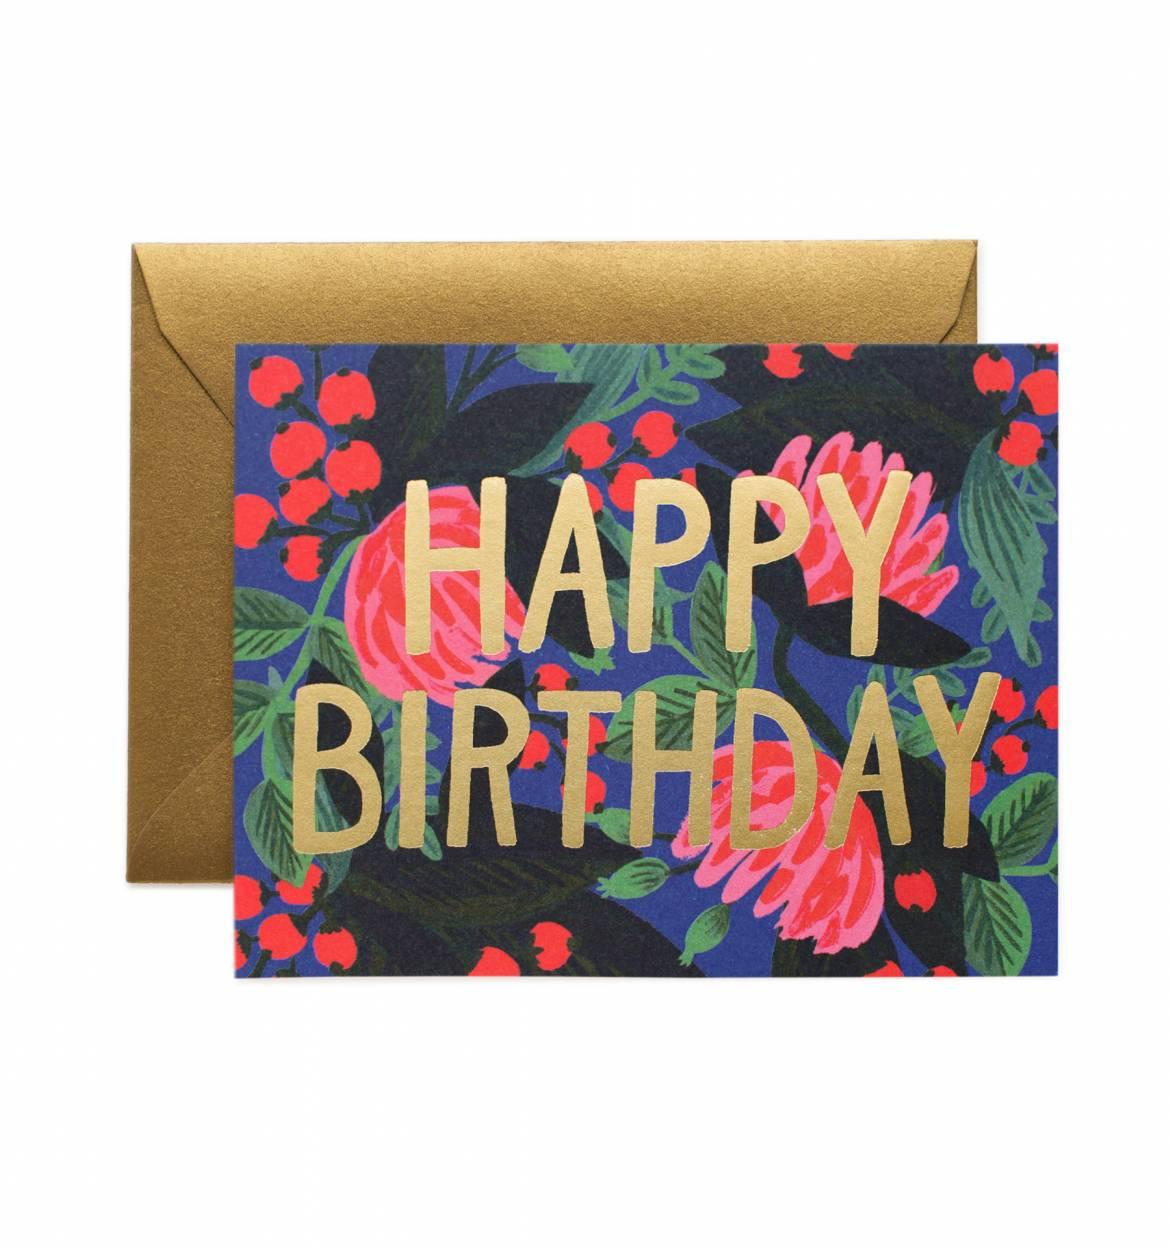 floral-foil-birthday-birthday-greeting-card-01a_1.jpg